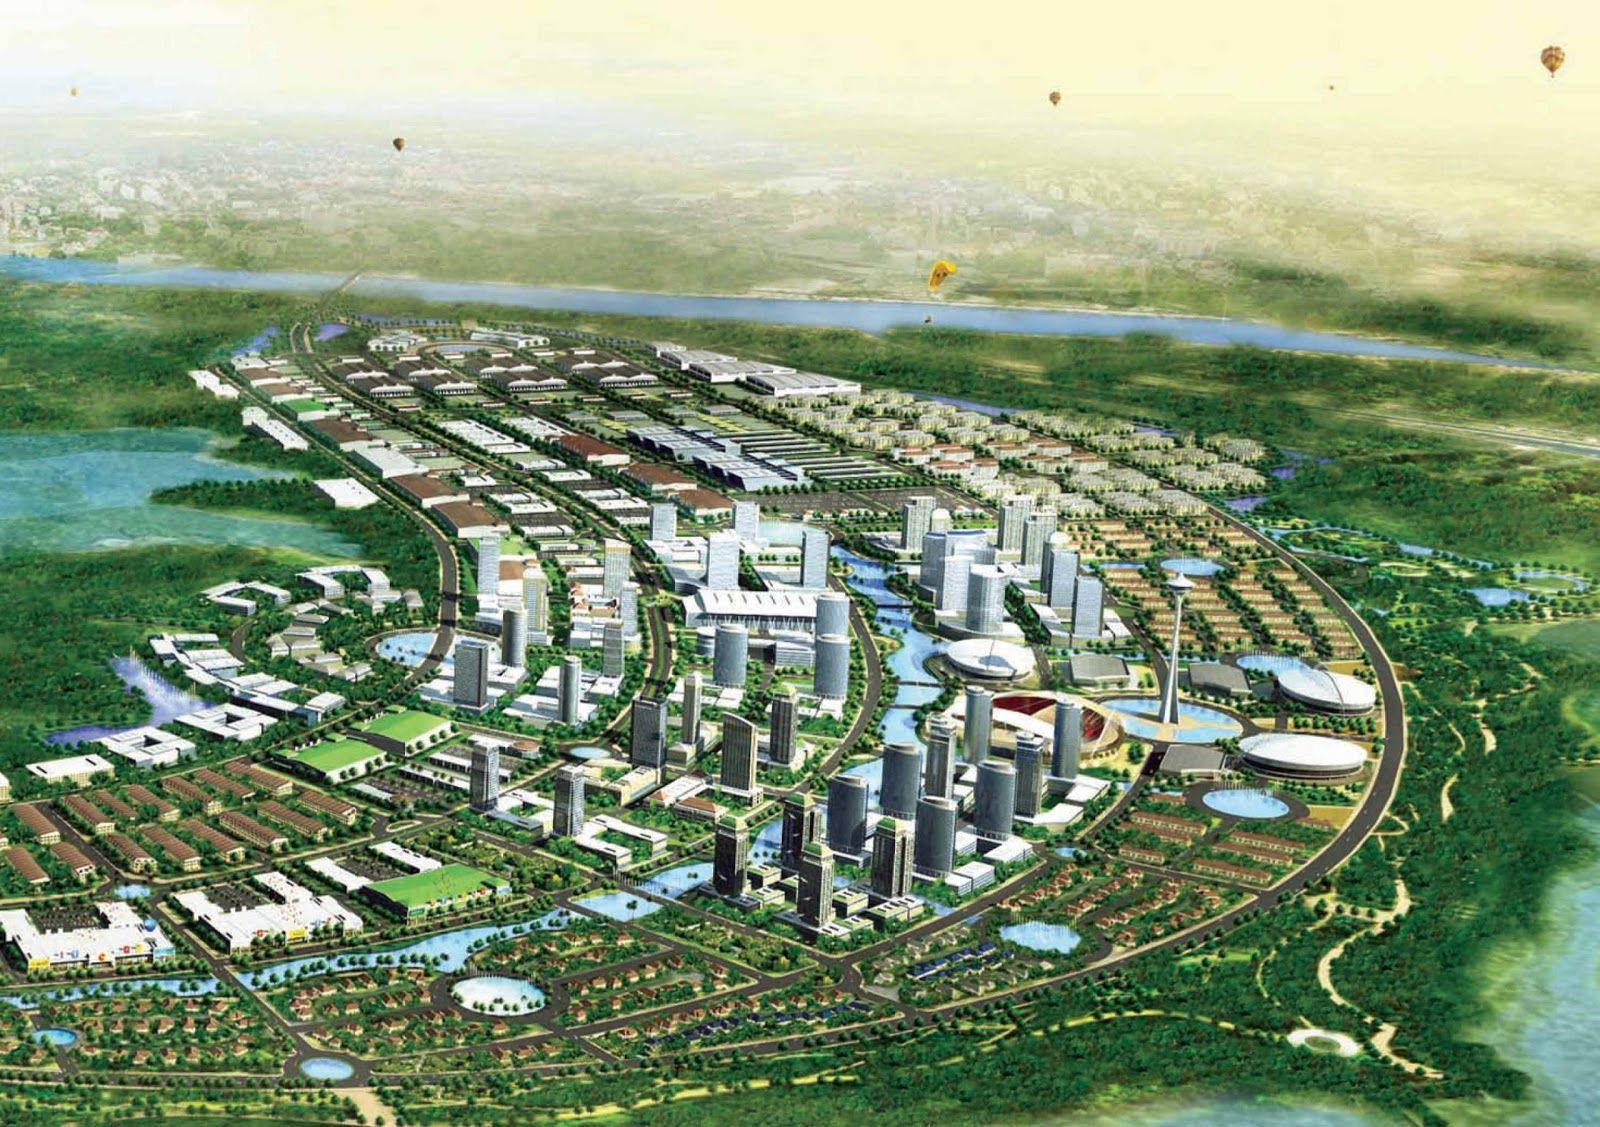 Garden City Proposal - Skyscrapercity Study